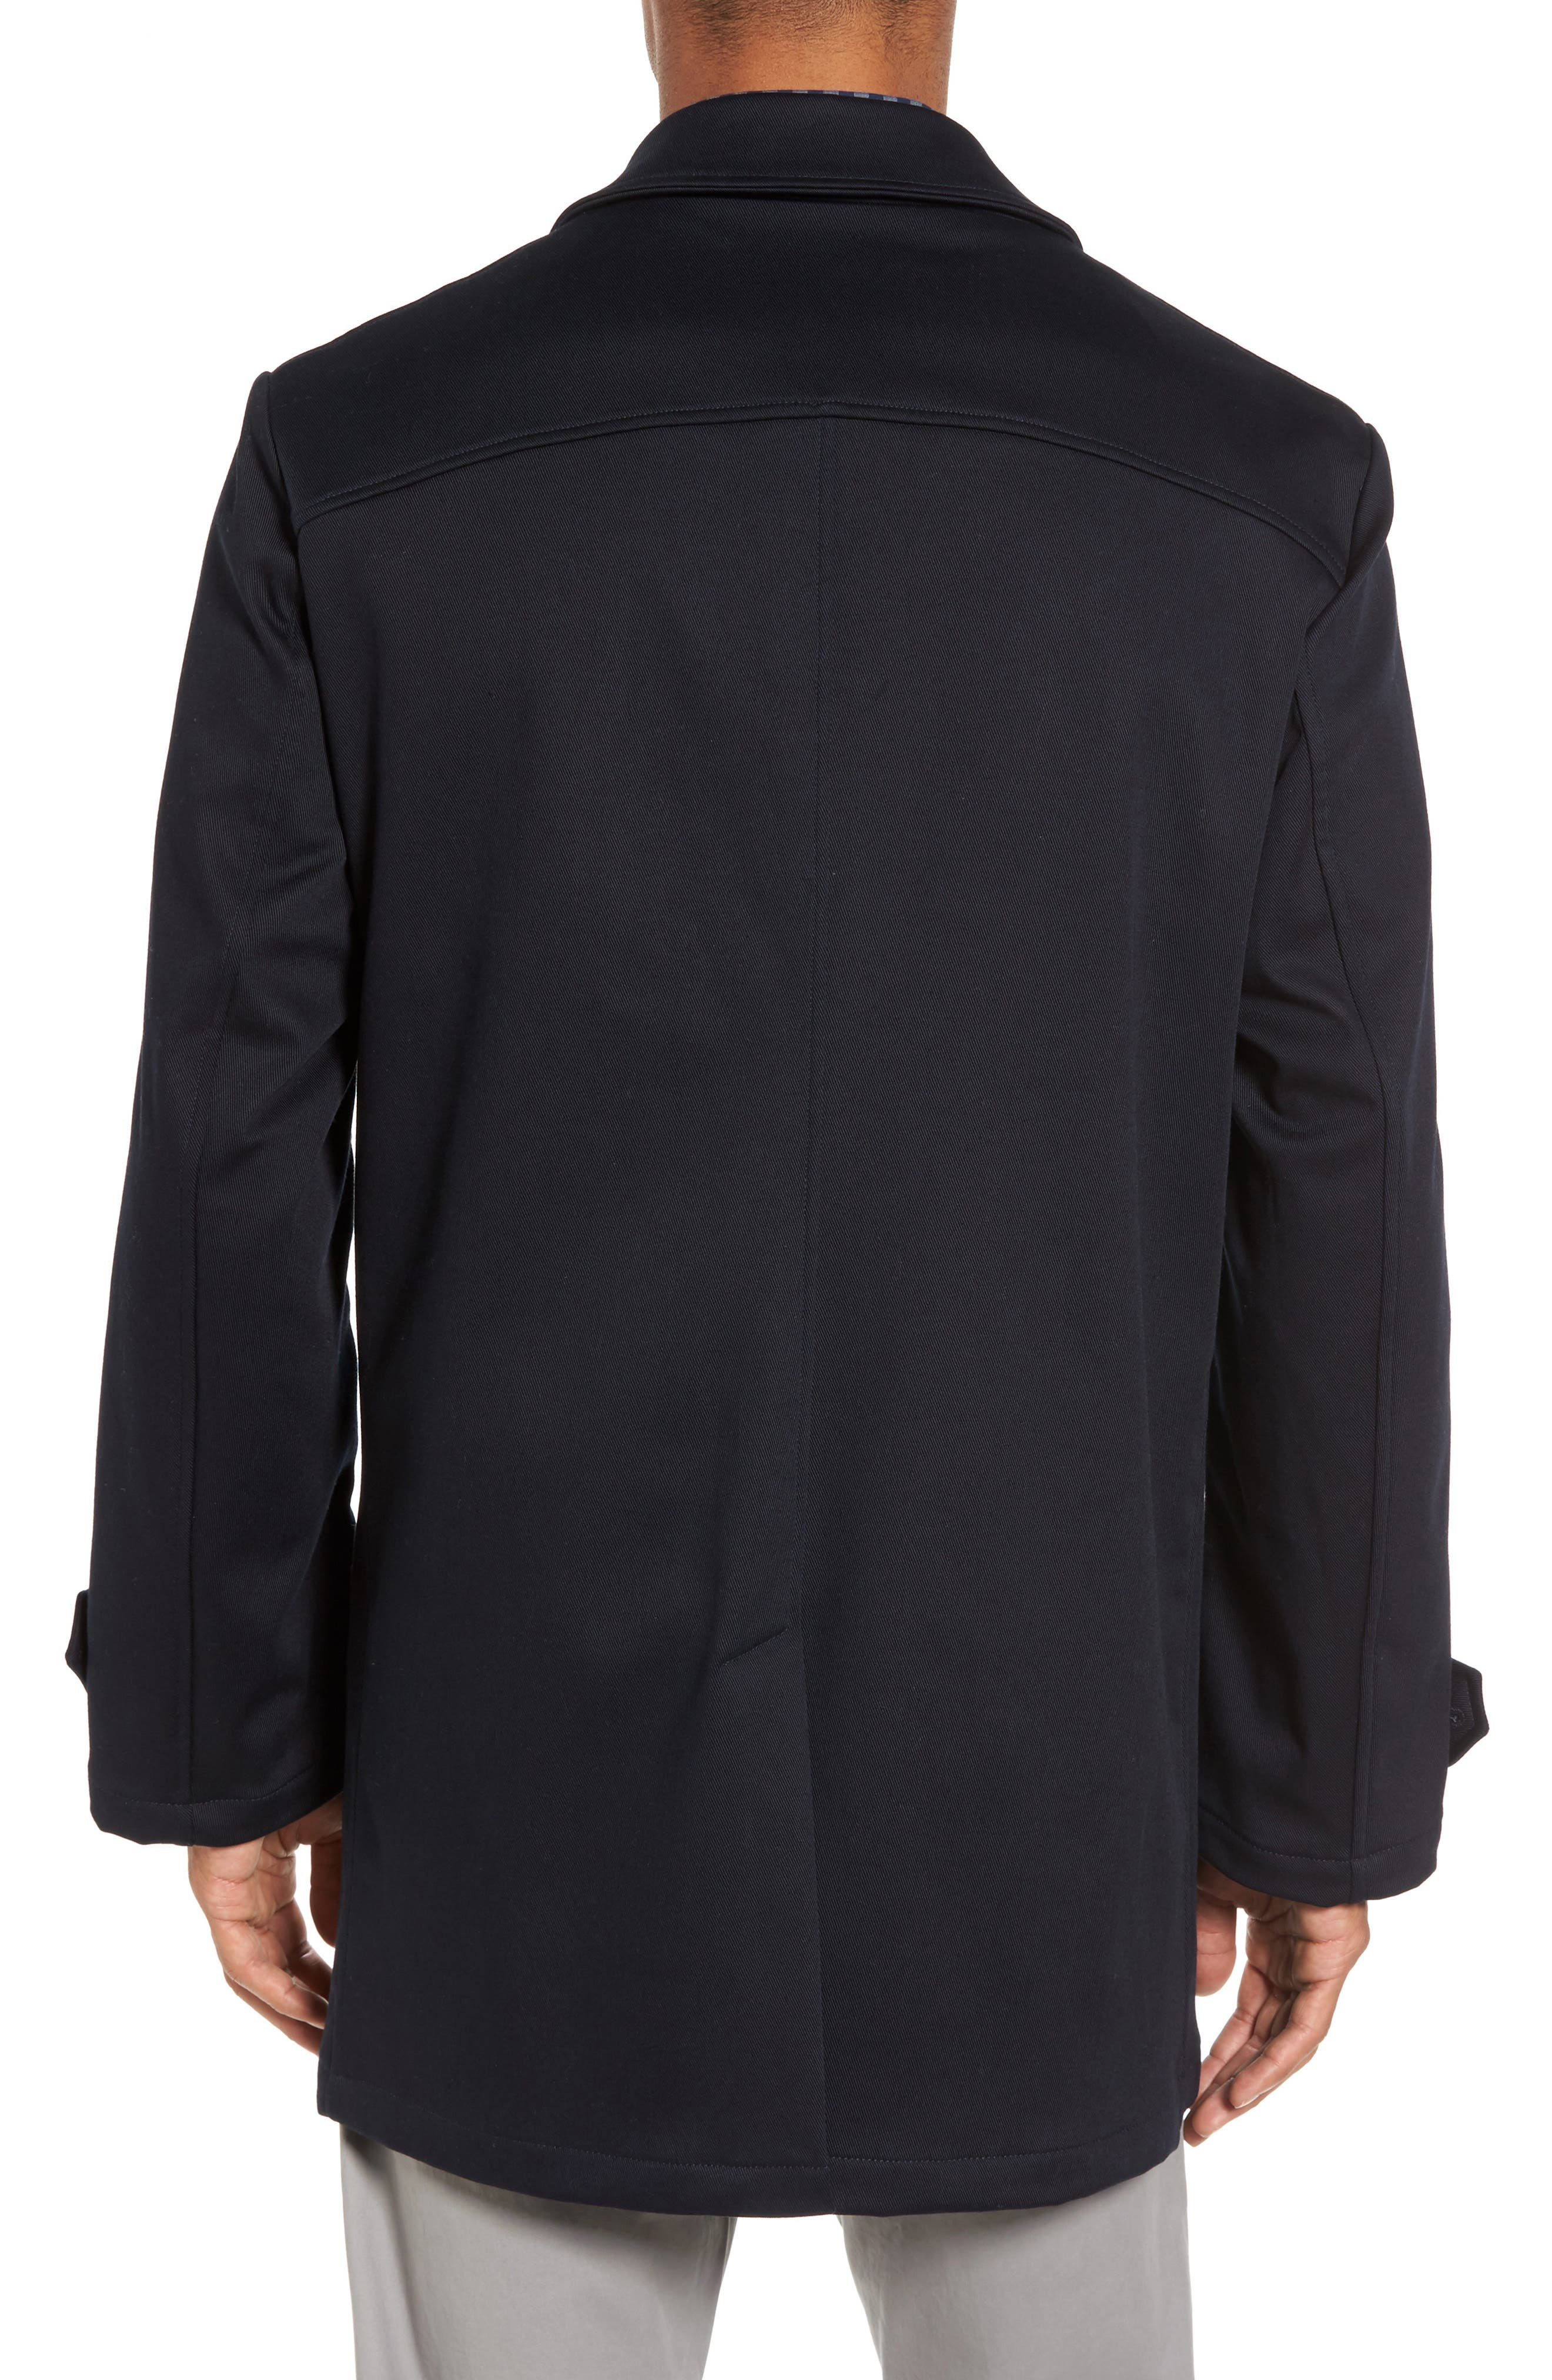 Alternate Image 2  - Nordstrom Men's Shop Grayson Stretch Cotton Blend Car Coat